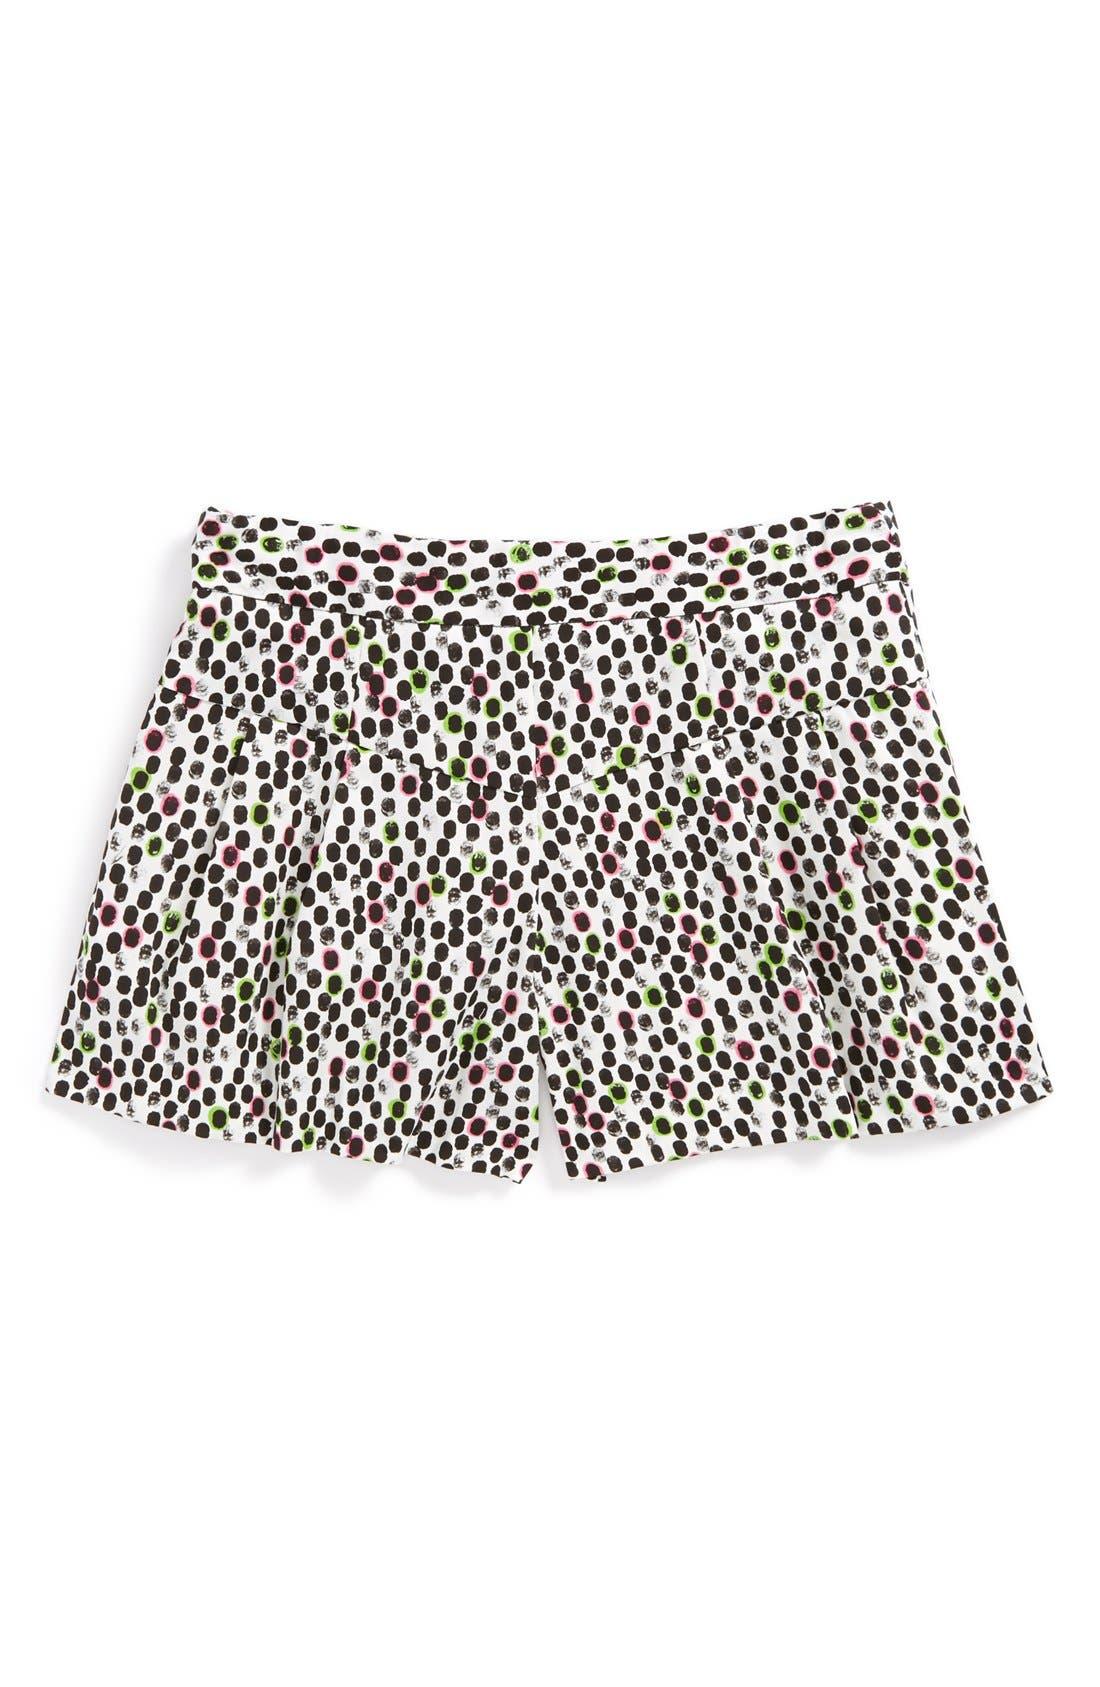 Alternate Image 2  - Milly Minis 'Ocelot' Shorts (Big Girls)